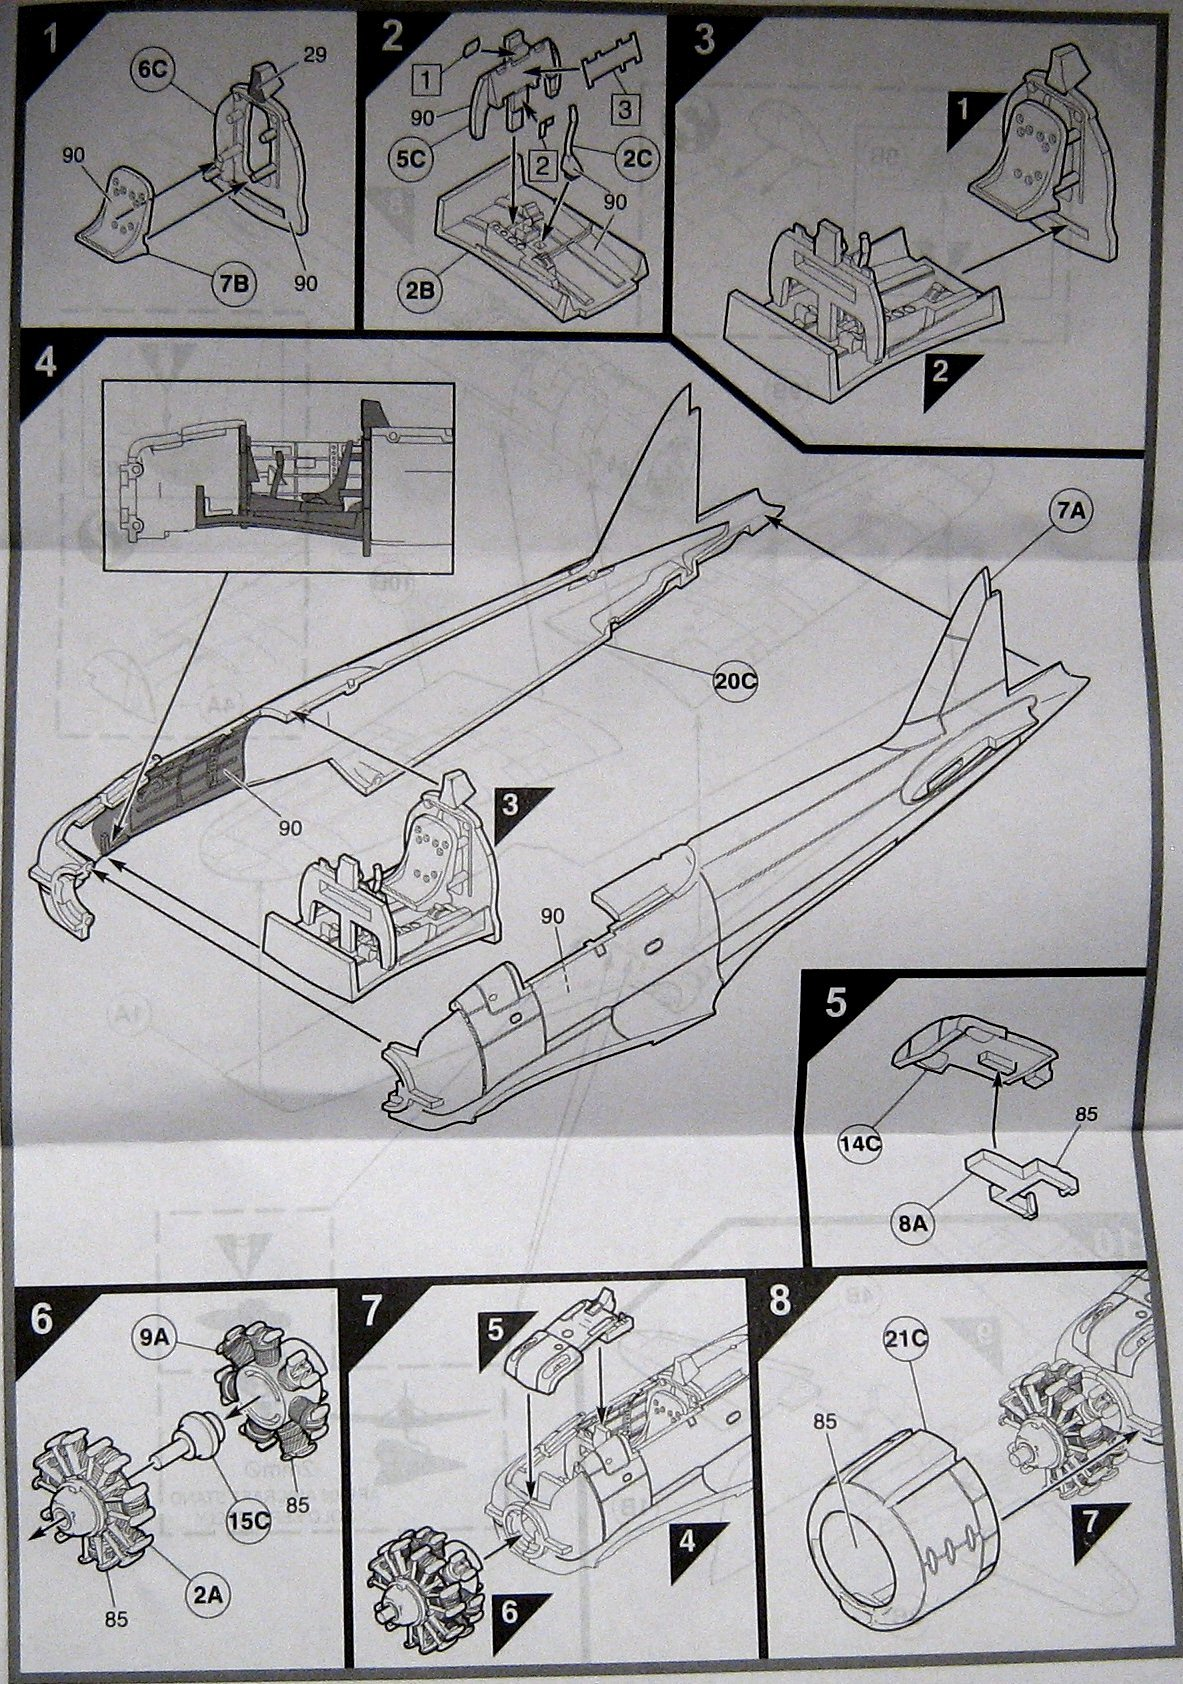 Mitsubishi A6m2b Zero Starter Set Airfix 55102 Diagram 2 Afx55102 3